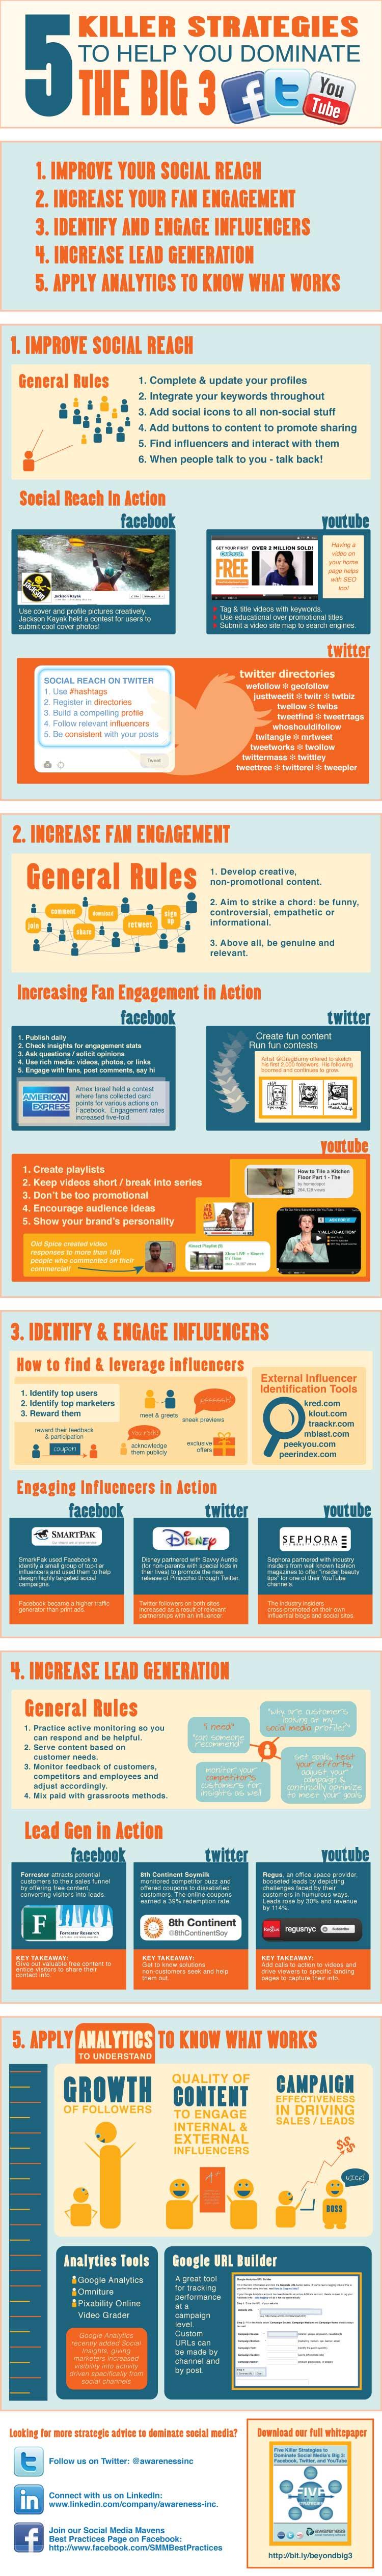 Social Media Killer Strategiesinfographic